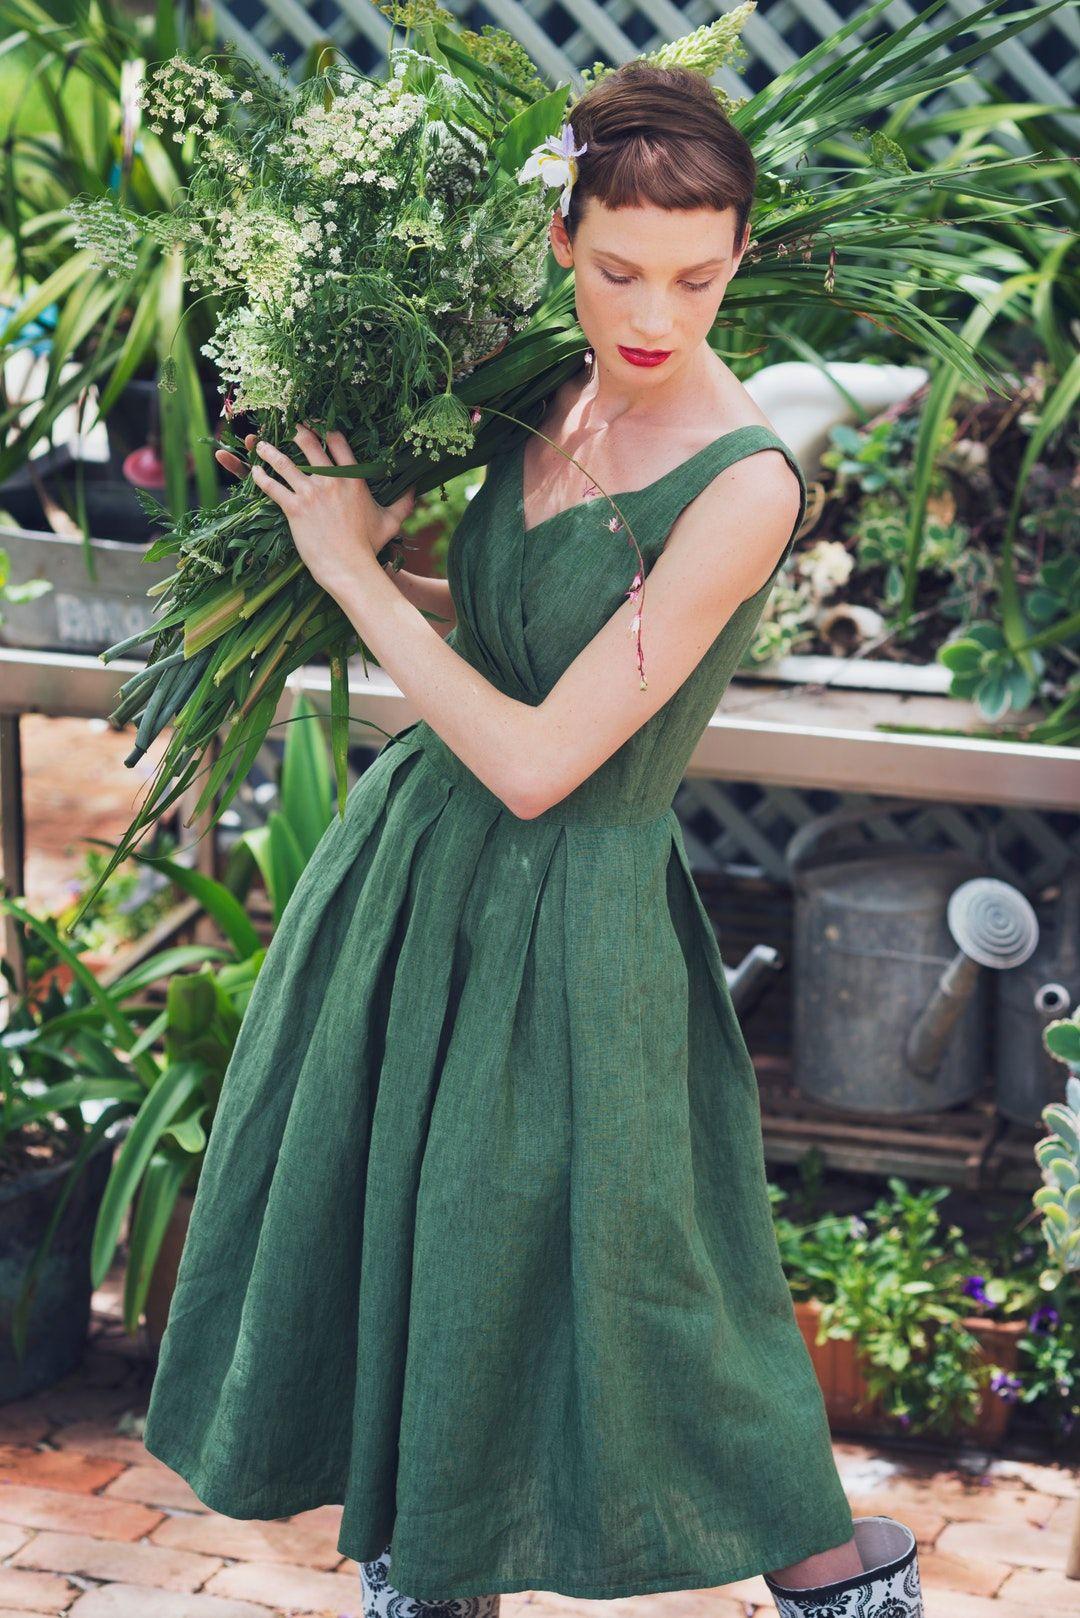 Backyard Medicine Medicinal Plants Meaning In Hindi Types Of Fashion Styles Wedding Inspiration Summer Fashion